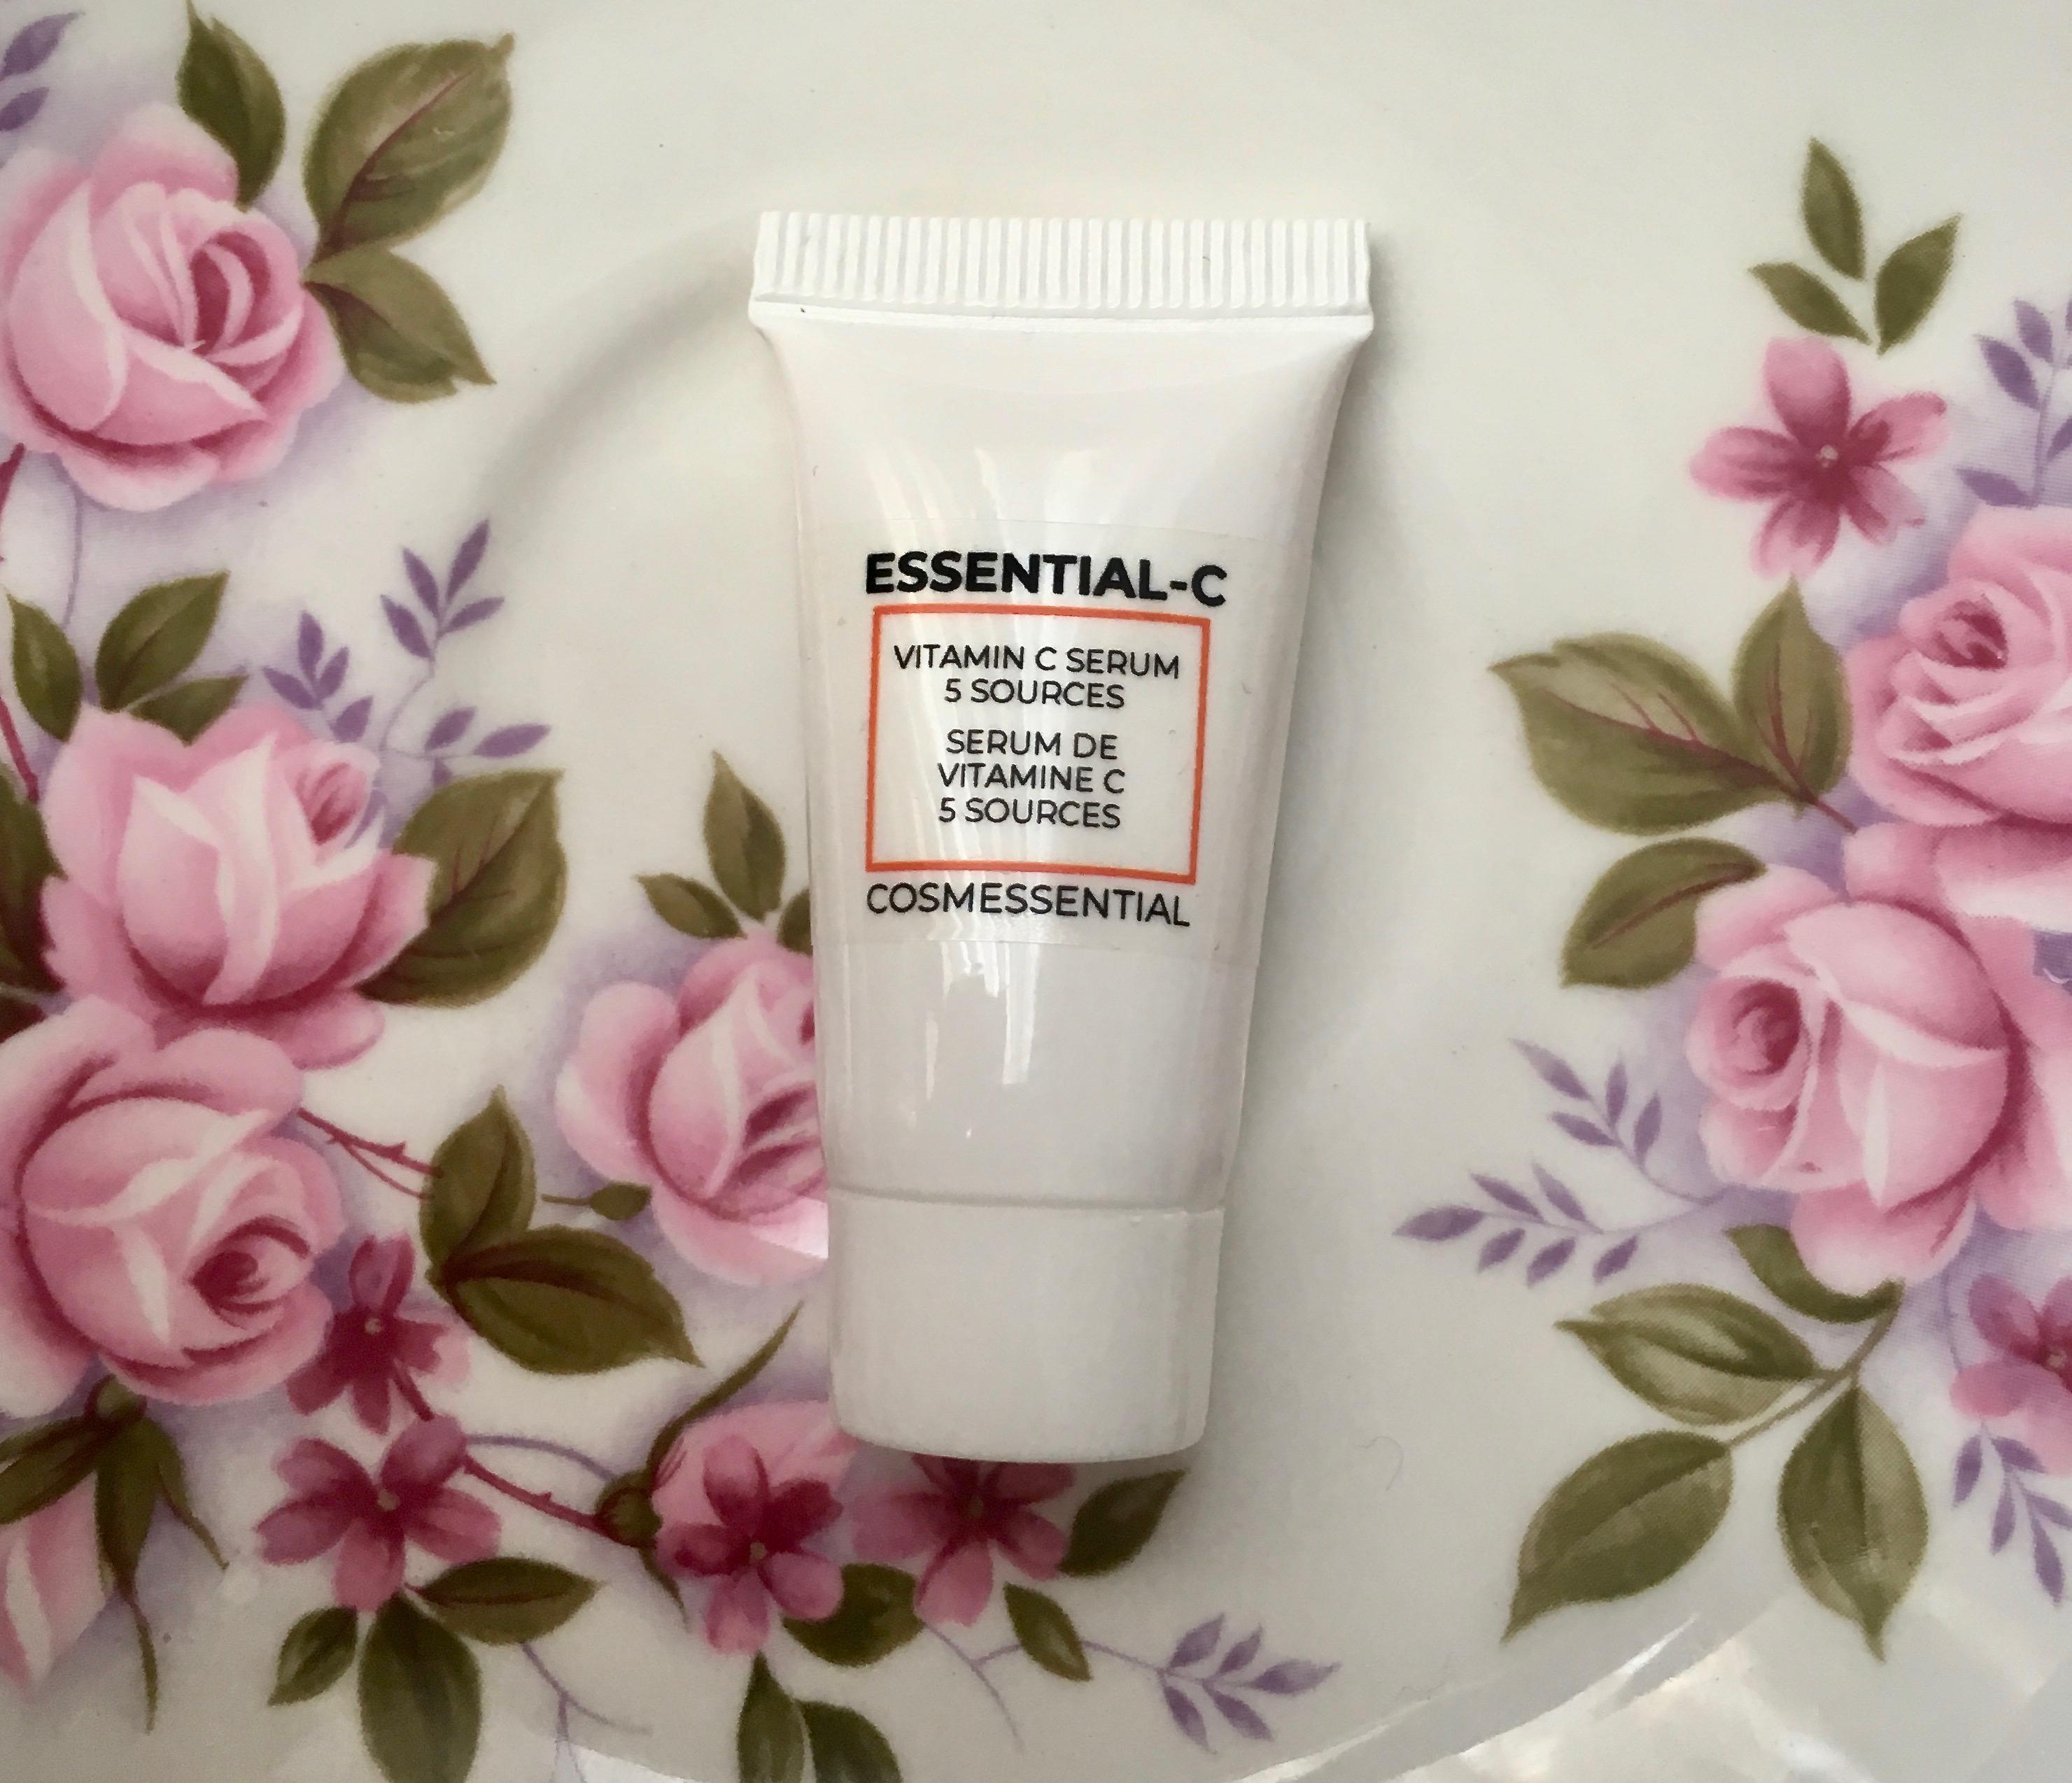 Cosmessential - Essential-C